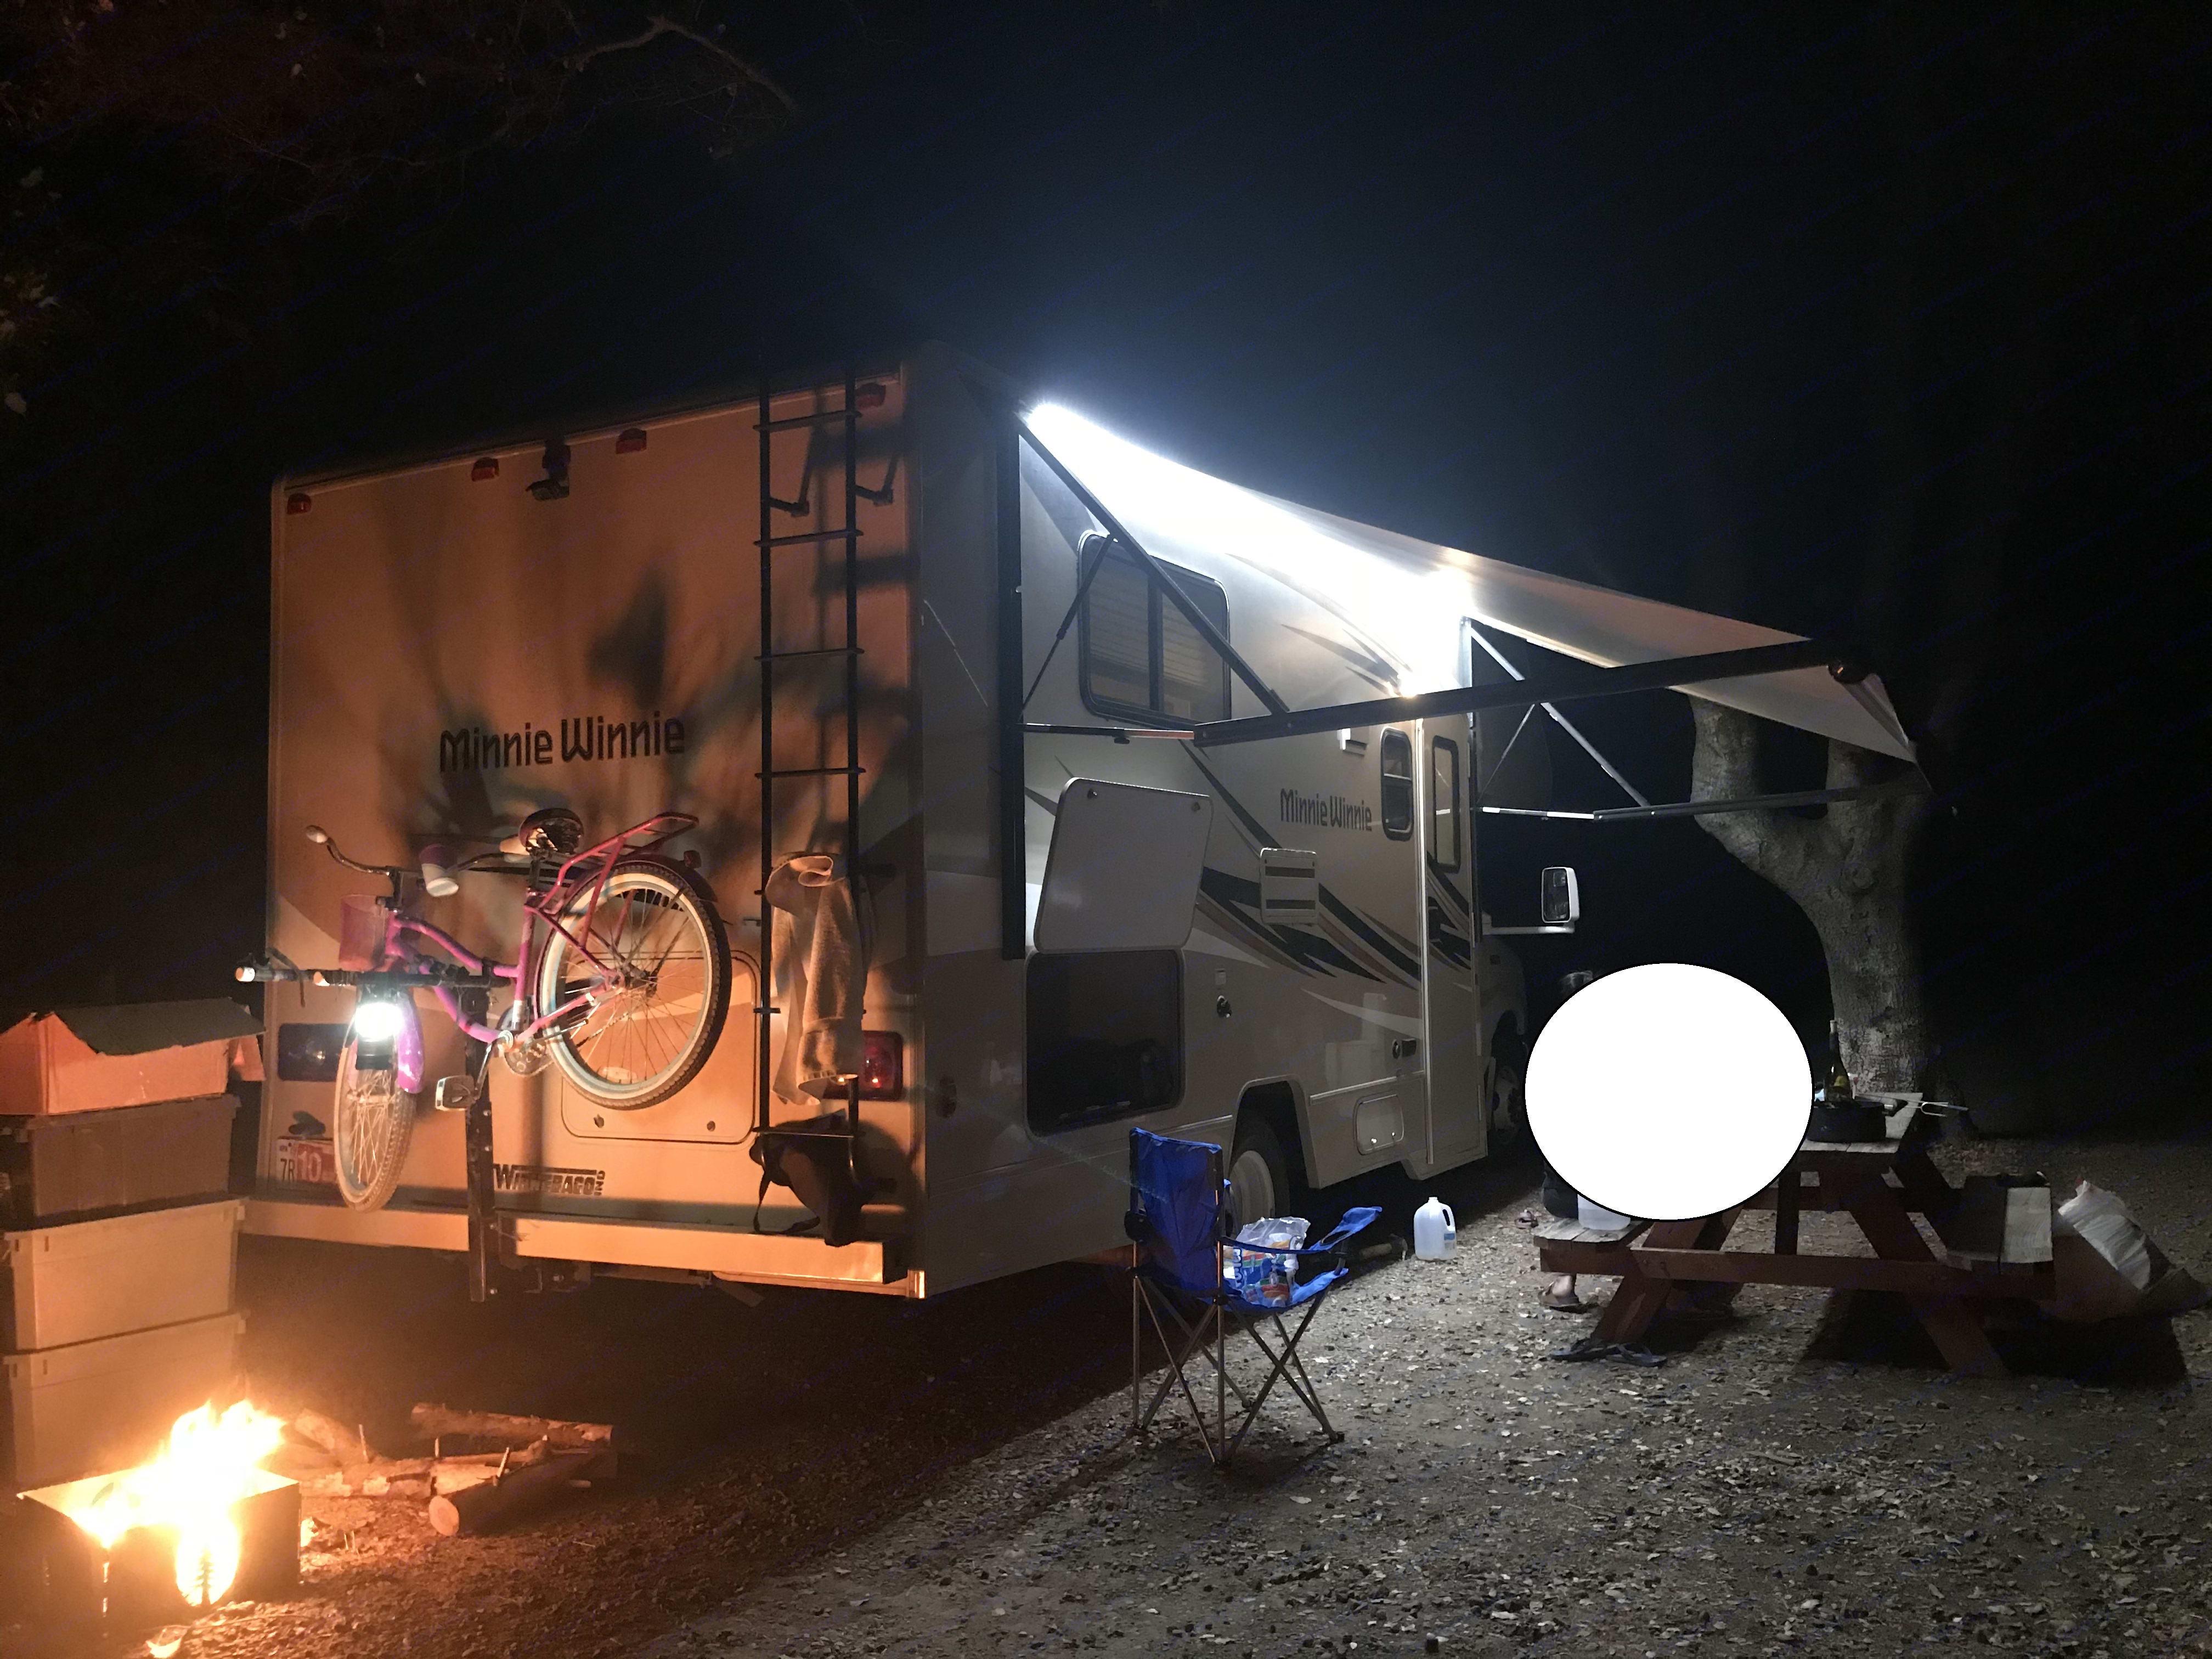 Outdoor LED Awning Light. Winnebago Minnie 2017